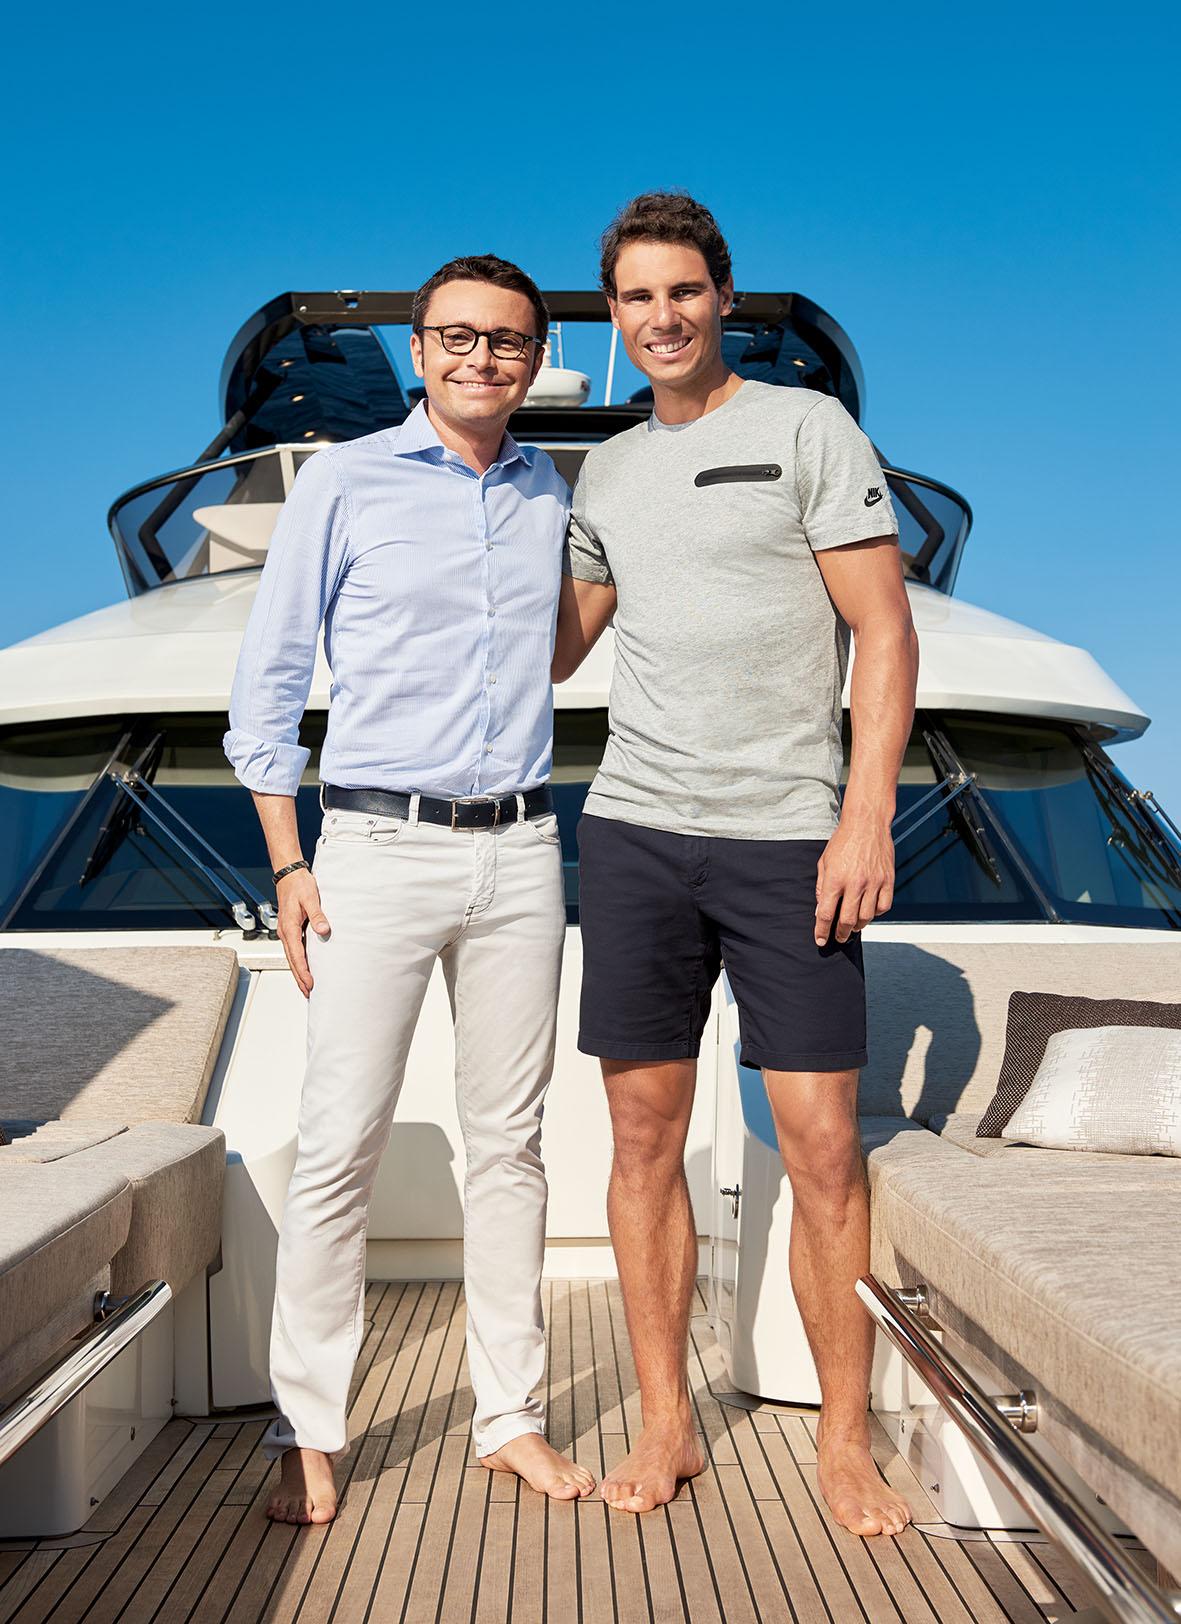 Rafael Nadal The Boat Is Allways My Great Refuge